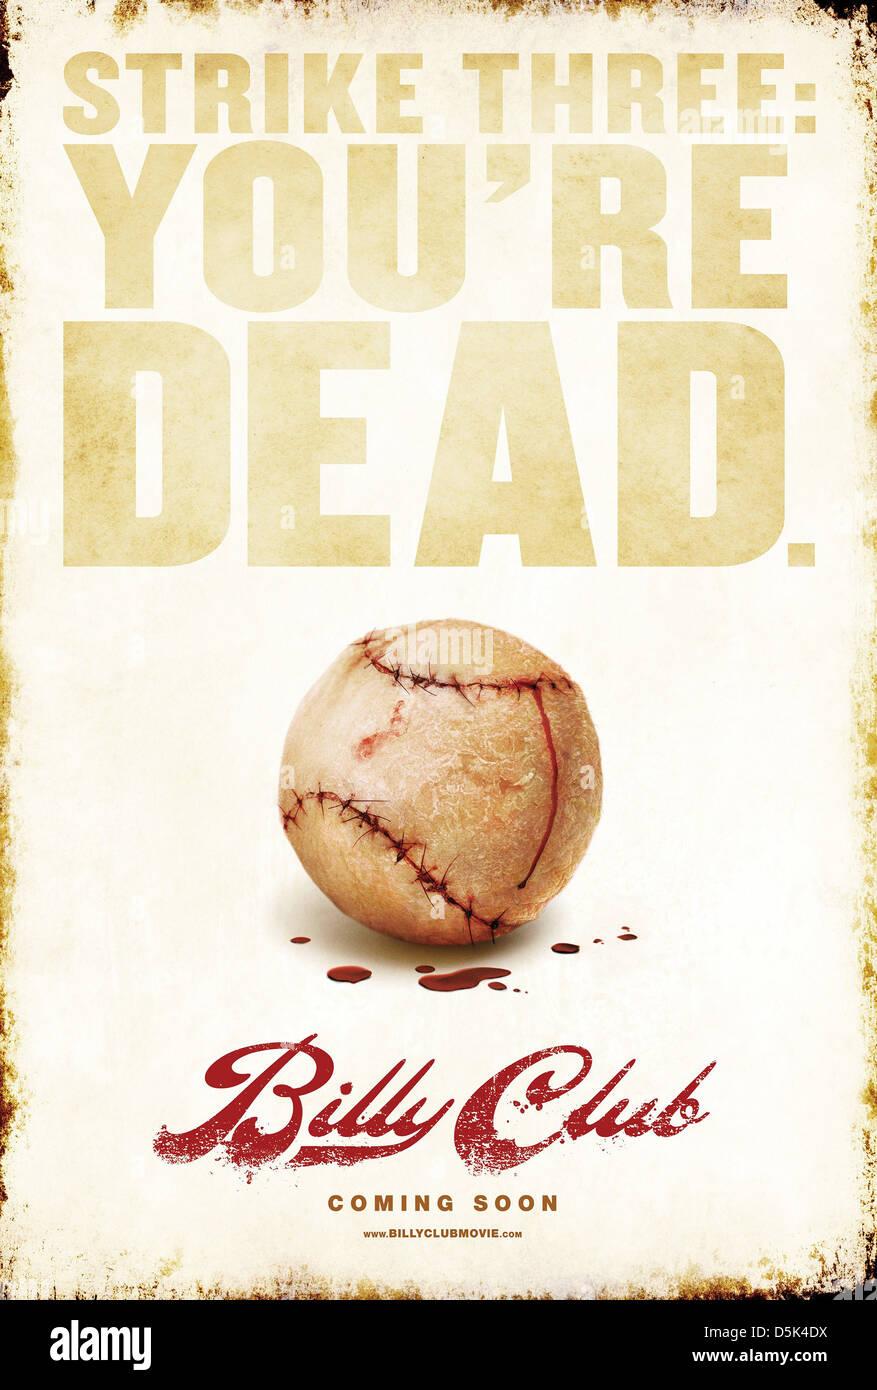 BASEBALL MOVIE POSTER BILLY CLUB (2012) - Stock Image